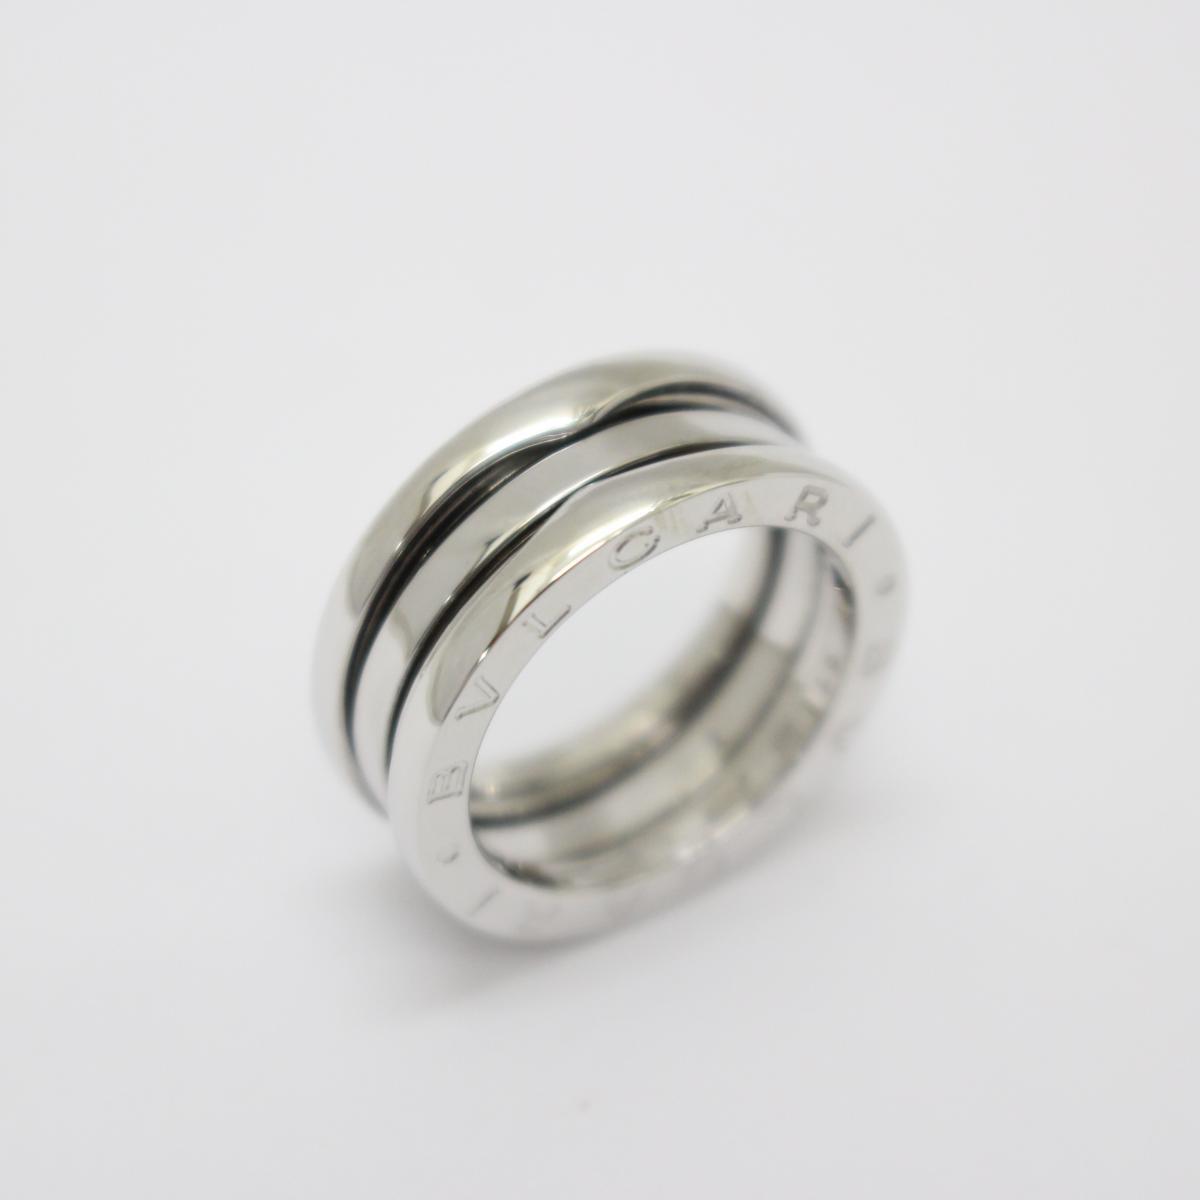 0cab25f0b566 中古】 ブルガリ B-zero1 リング Sサイズ 指輪 メンズ レディース K18WG ...